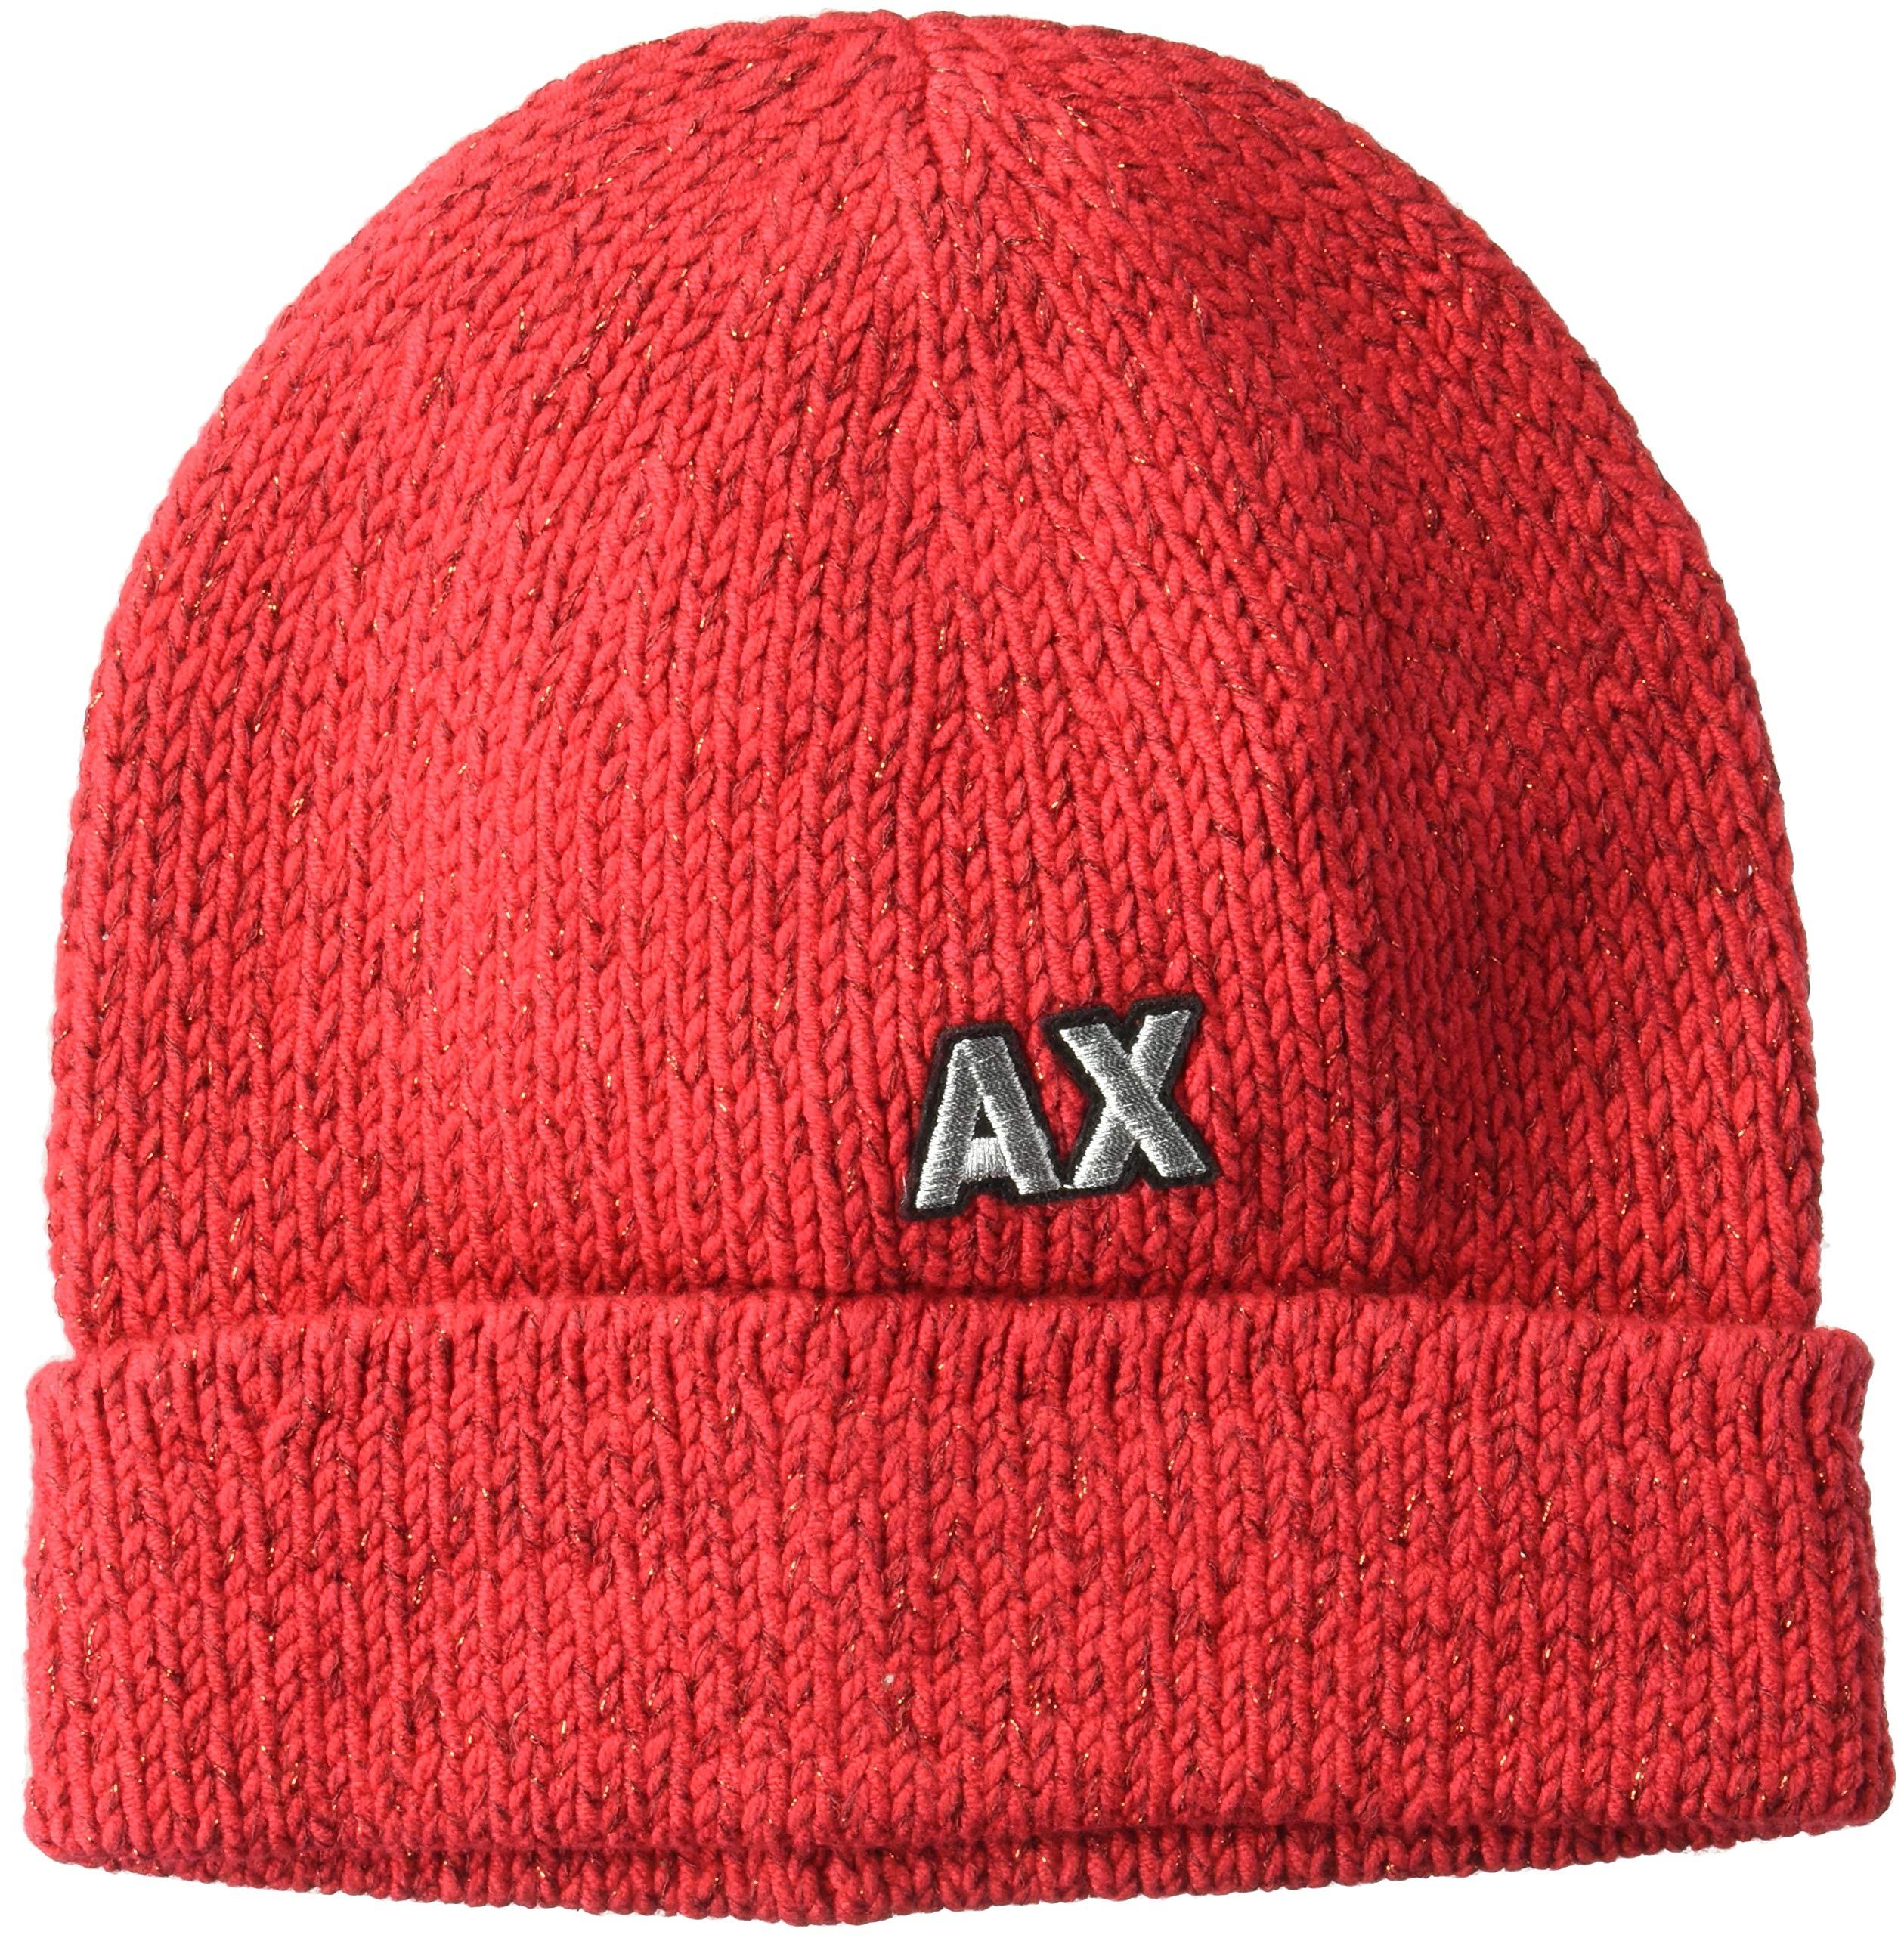 A|X Armani Exchange Women's AX Woven Beanie, Bloody Mary, TU